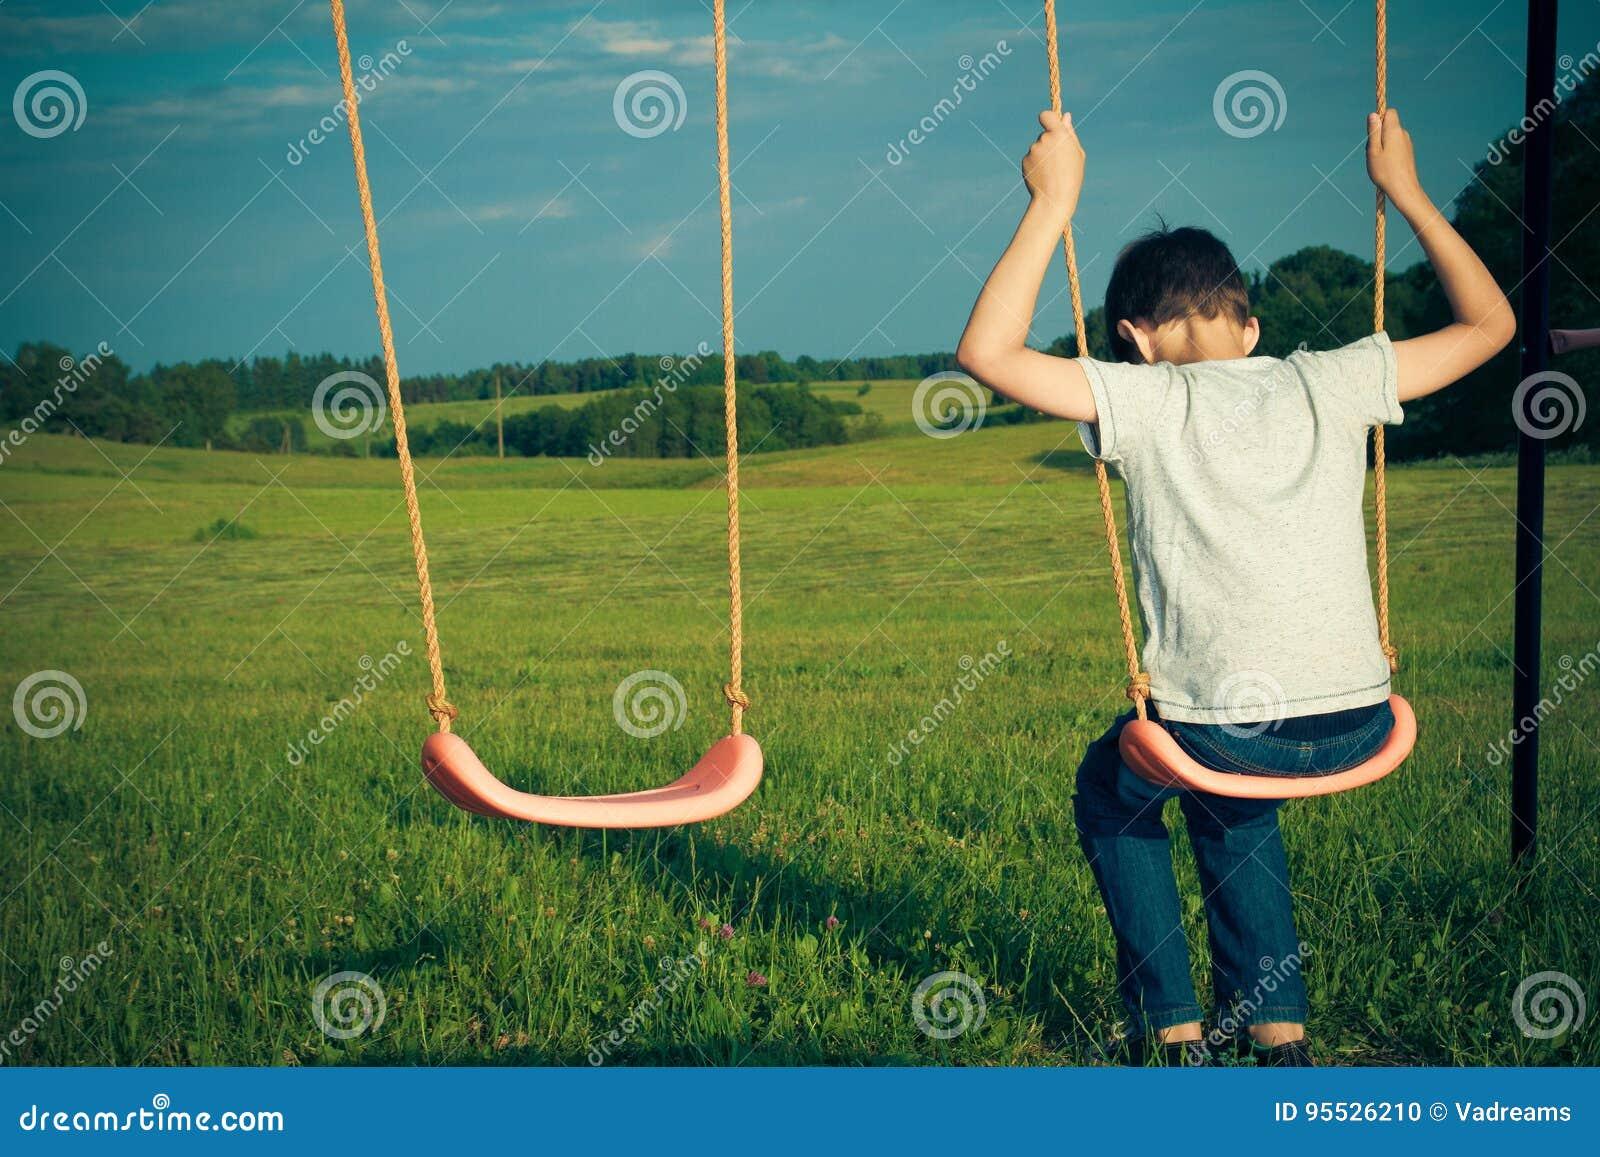 Sad lonely boy sitting on swing